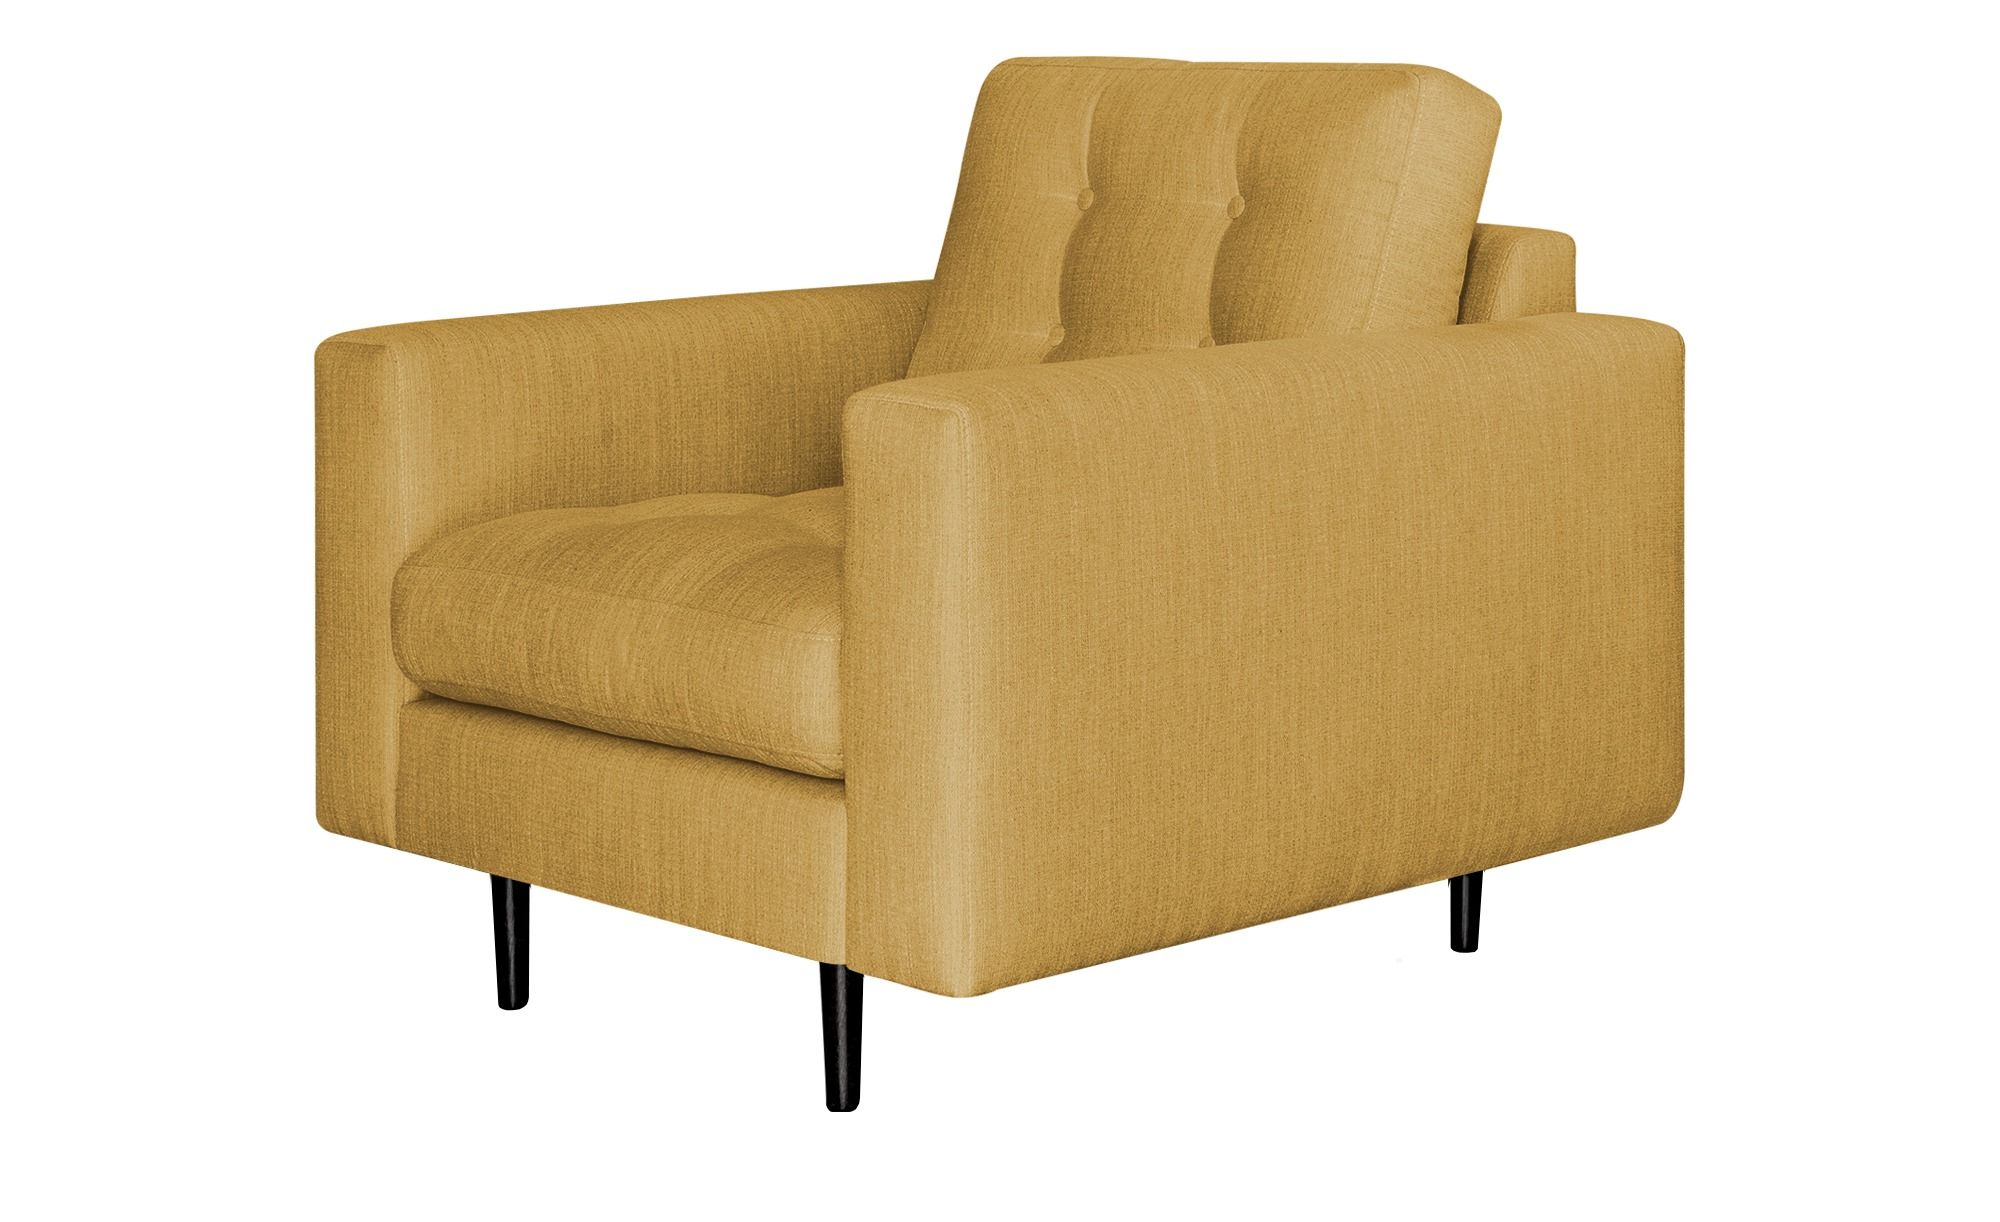 Gray & Jones Sessel  Gypsy ¦ gelb ¦ Maße (cm): B: 97 H: 90 T: 92 Polstermöbel > Sessel > Polstersessel - Höffner